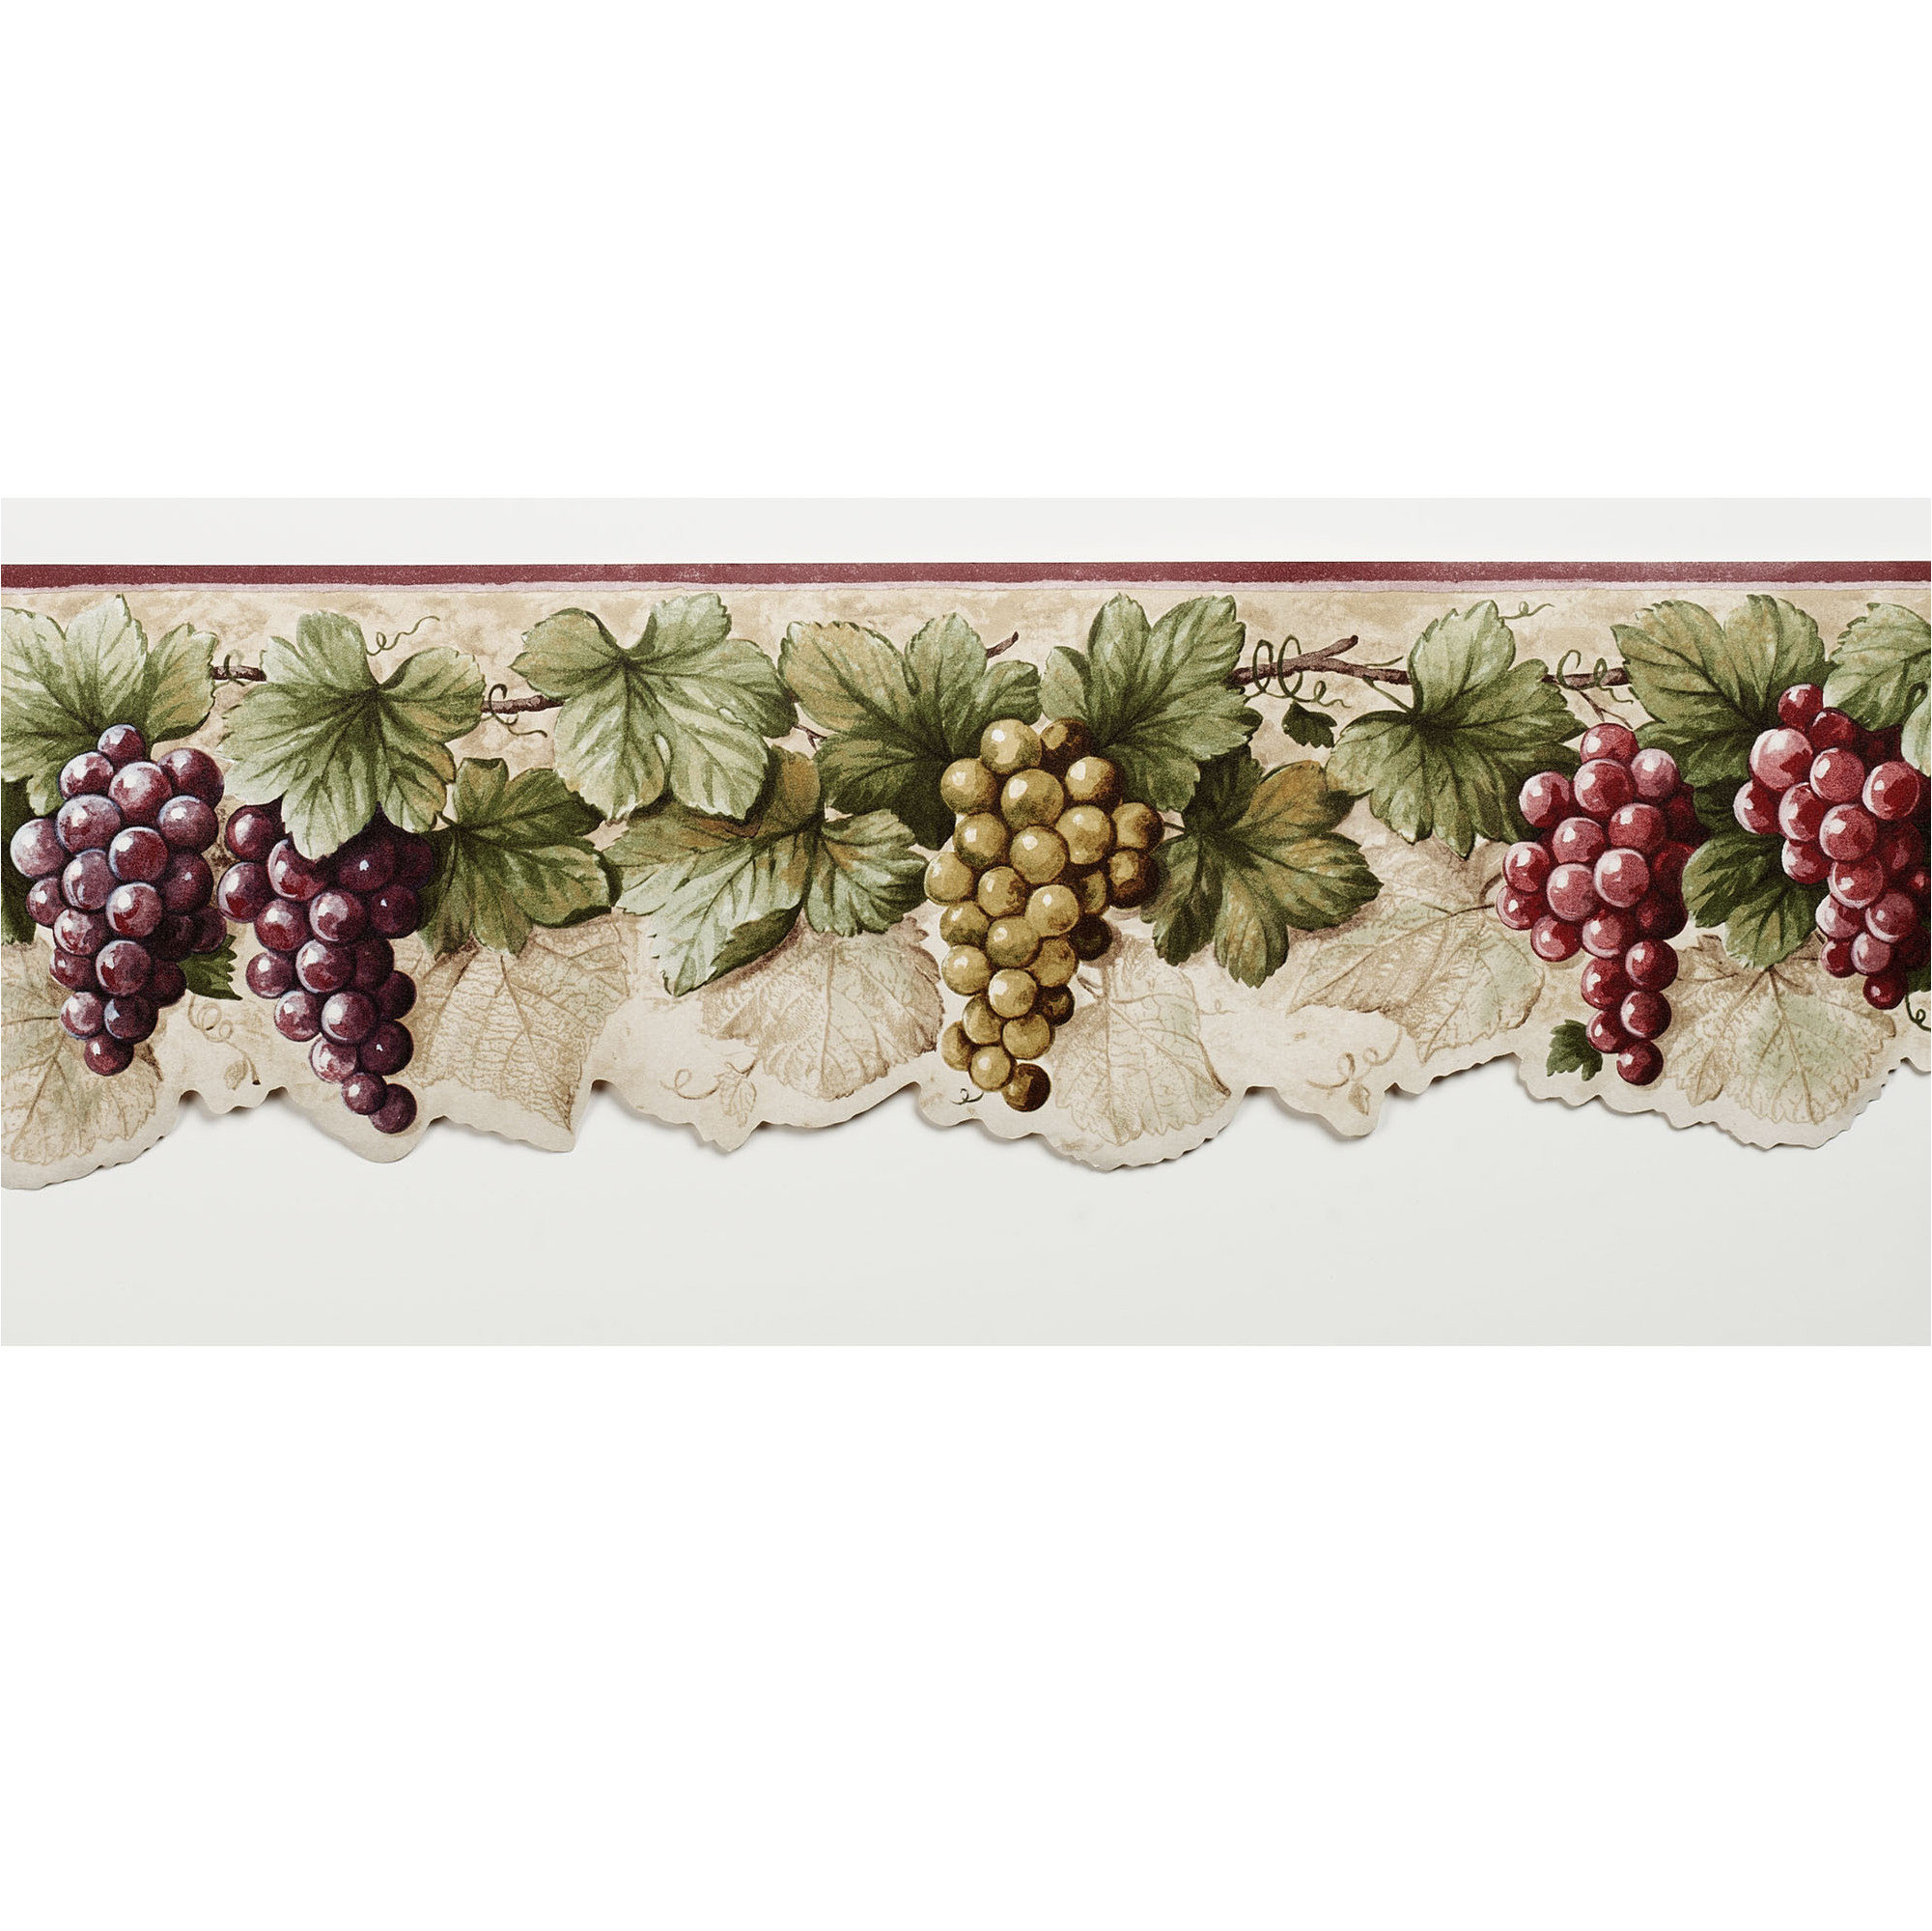 Home Harvest Time Grapes Wallpaper Border 2001x2000